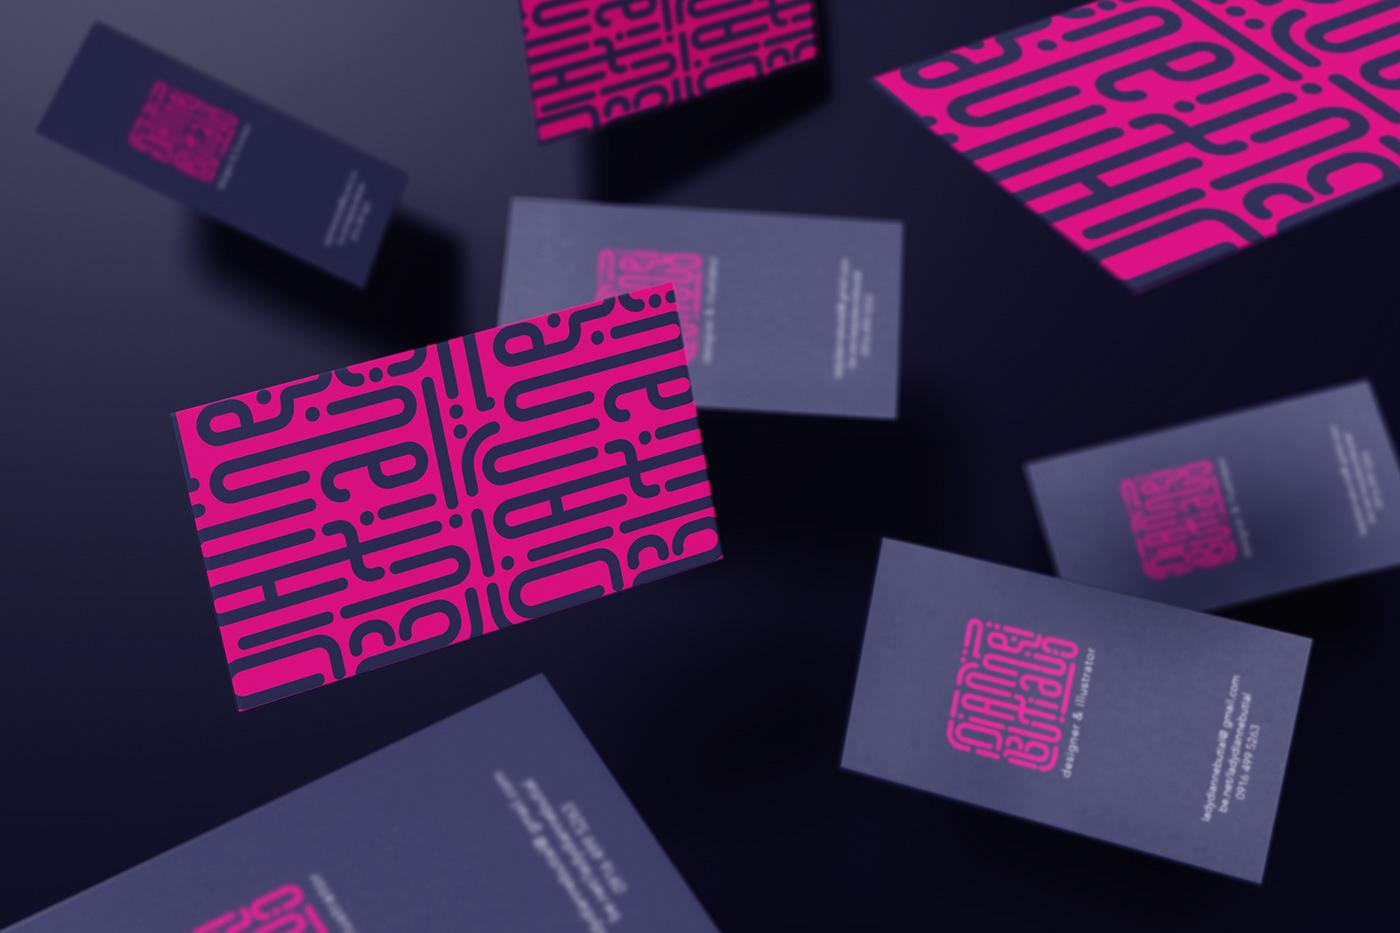 branding  Dianne Butial pink logo personal branding Graphic Designer Illustrator